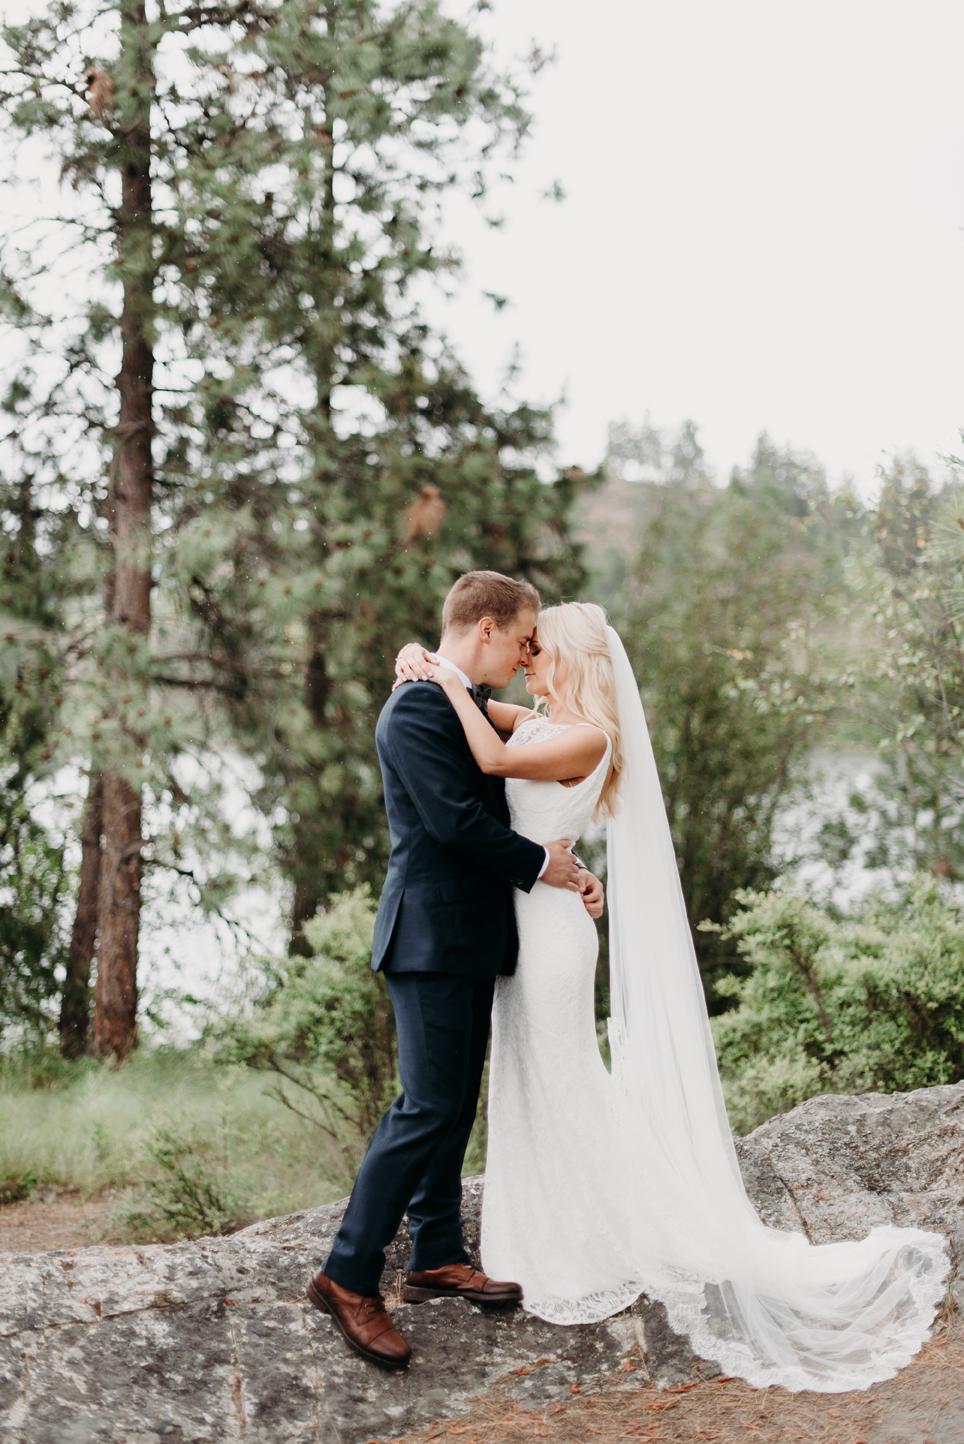 Rachel and Brent Wedding-125-Edit.jpg